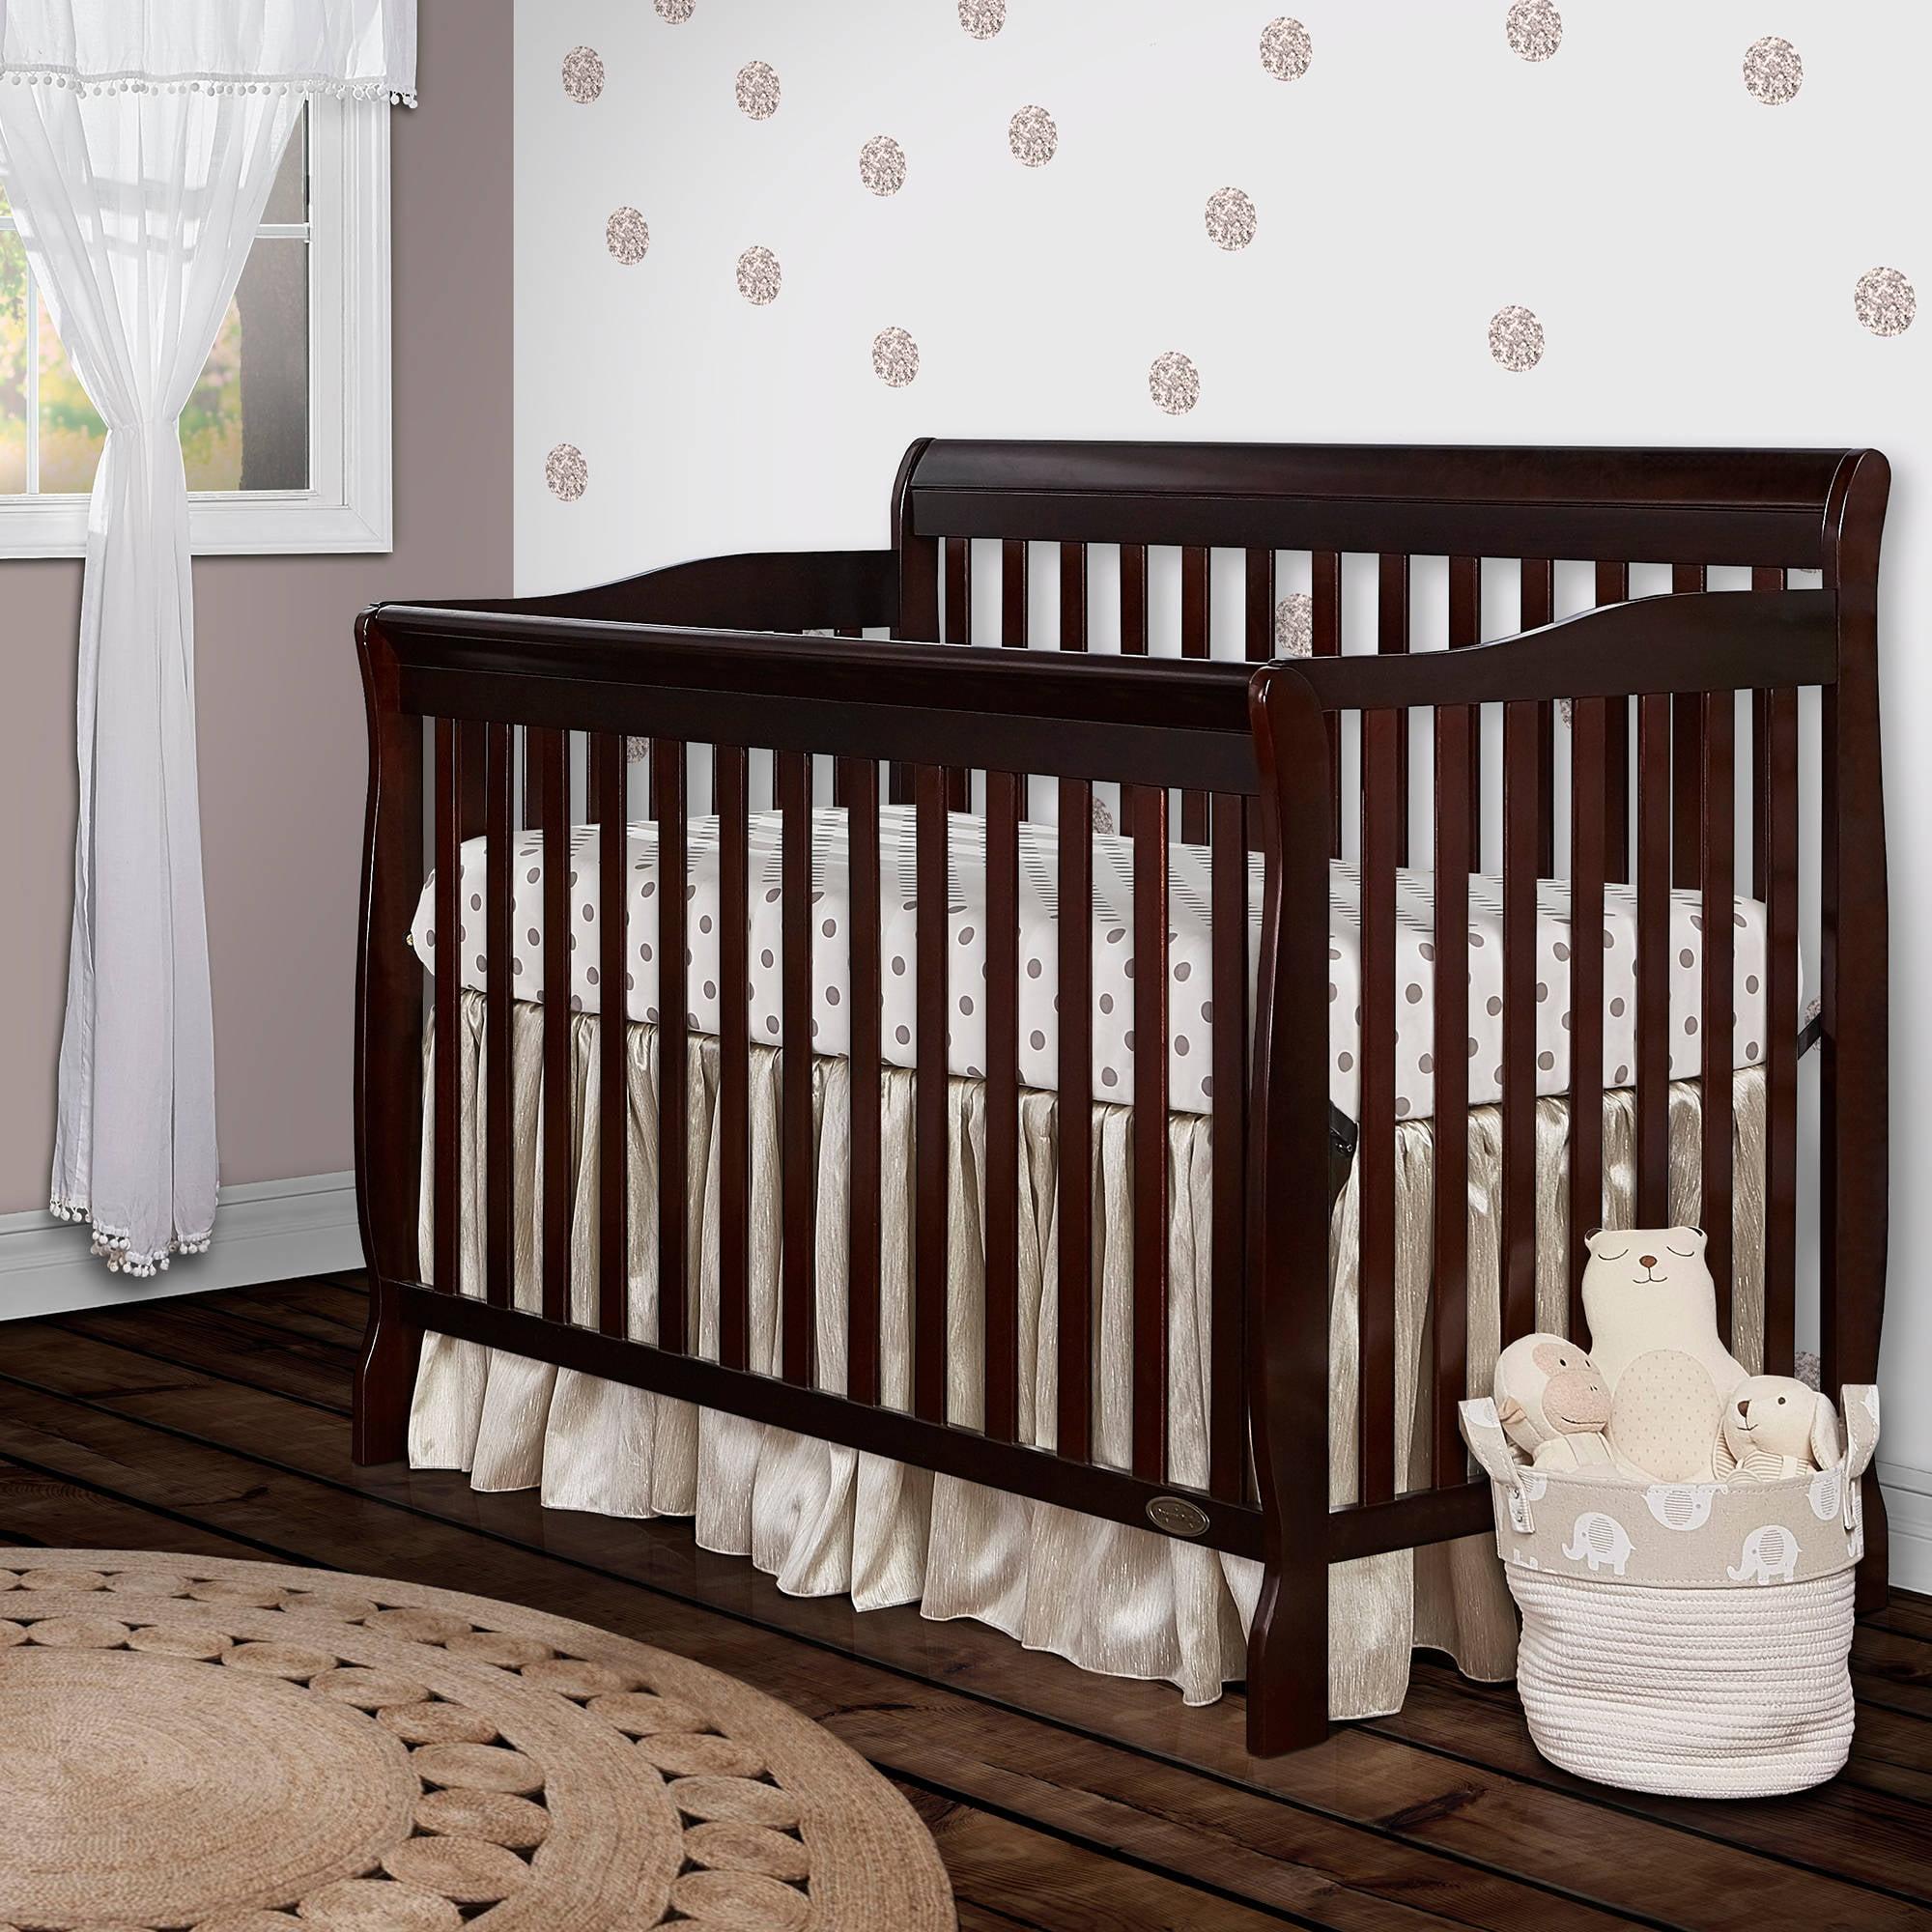 Baby cribs little rock ar - Baby Cribs Little Rock Ar 46